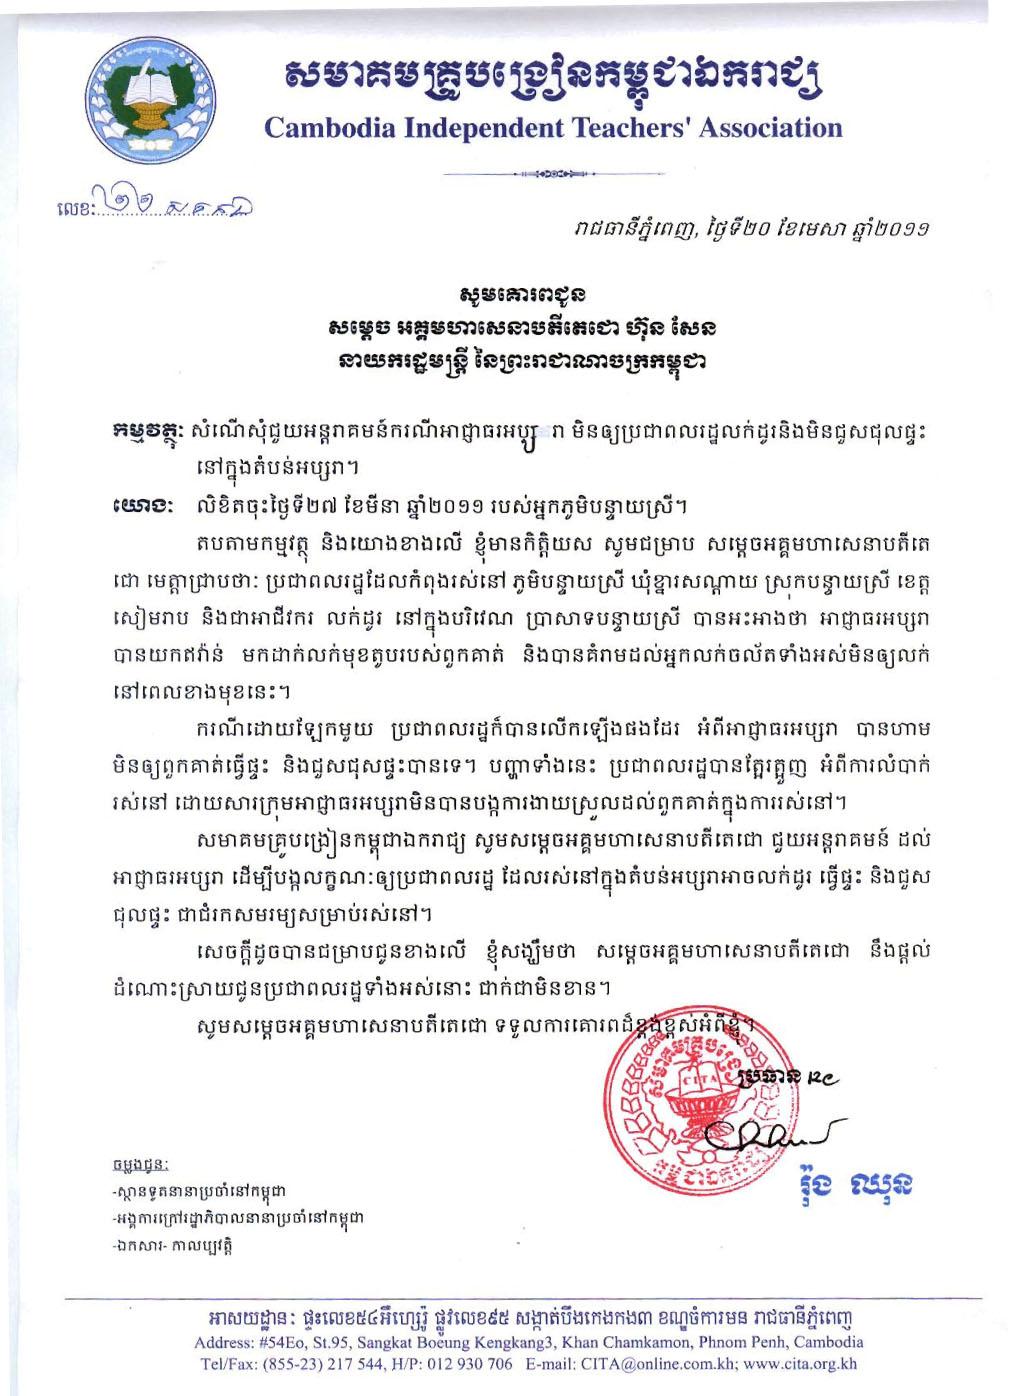 Khmer cambodia spy ki media evictions ngo law high among donor khmer cambodia spy ki media evictions ngo law high among donor concerns plus 24 more stopboris Images